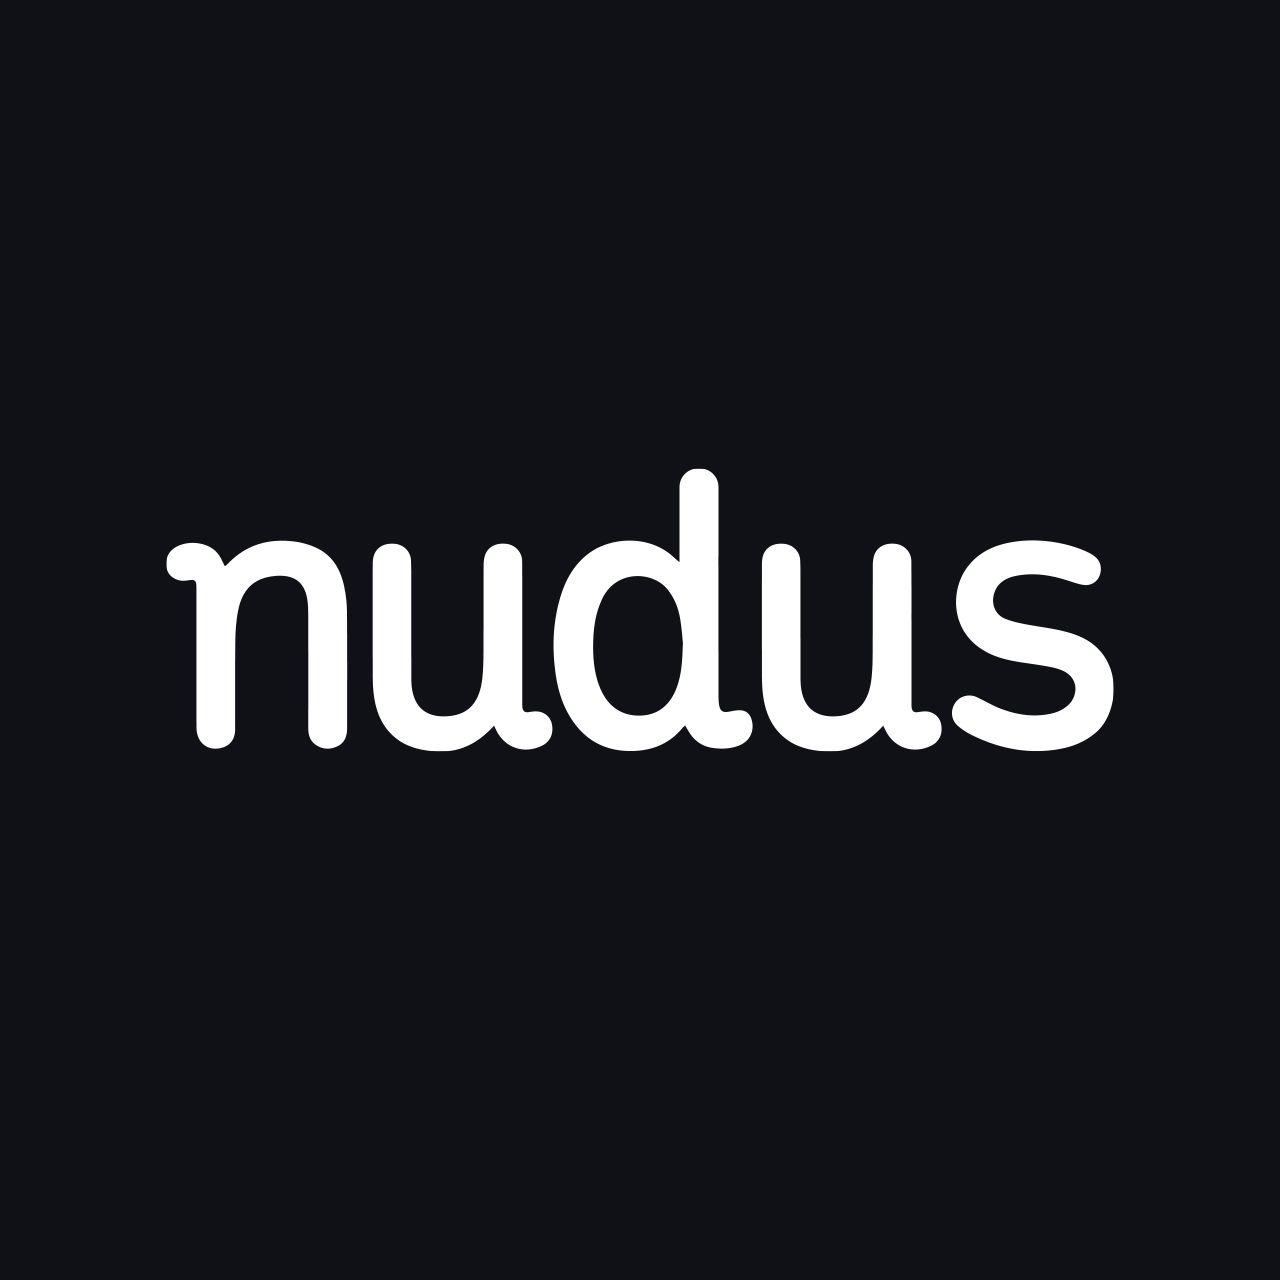 Nudus Branding Logo